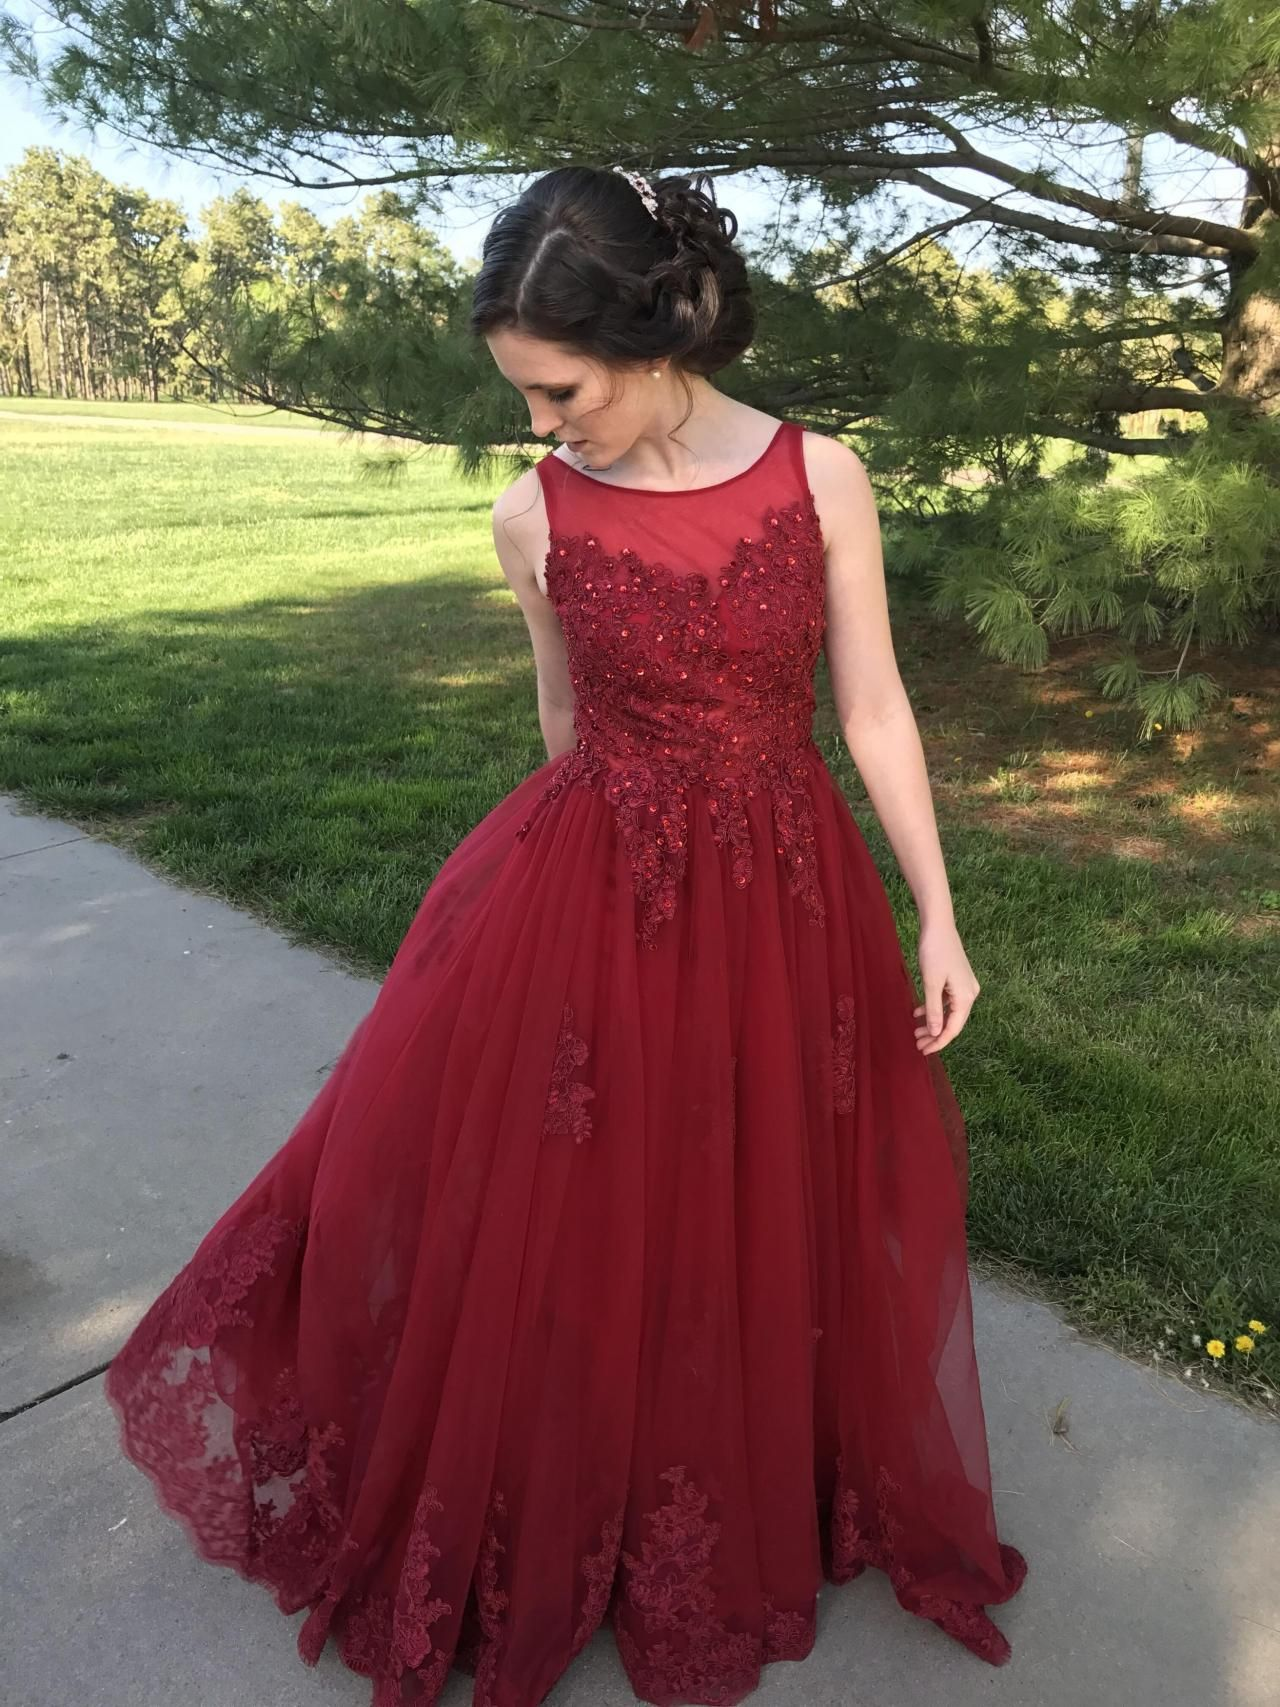 Prom dressesburgundy prom dressespink prom dresseslace prom